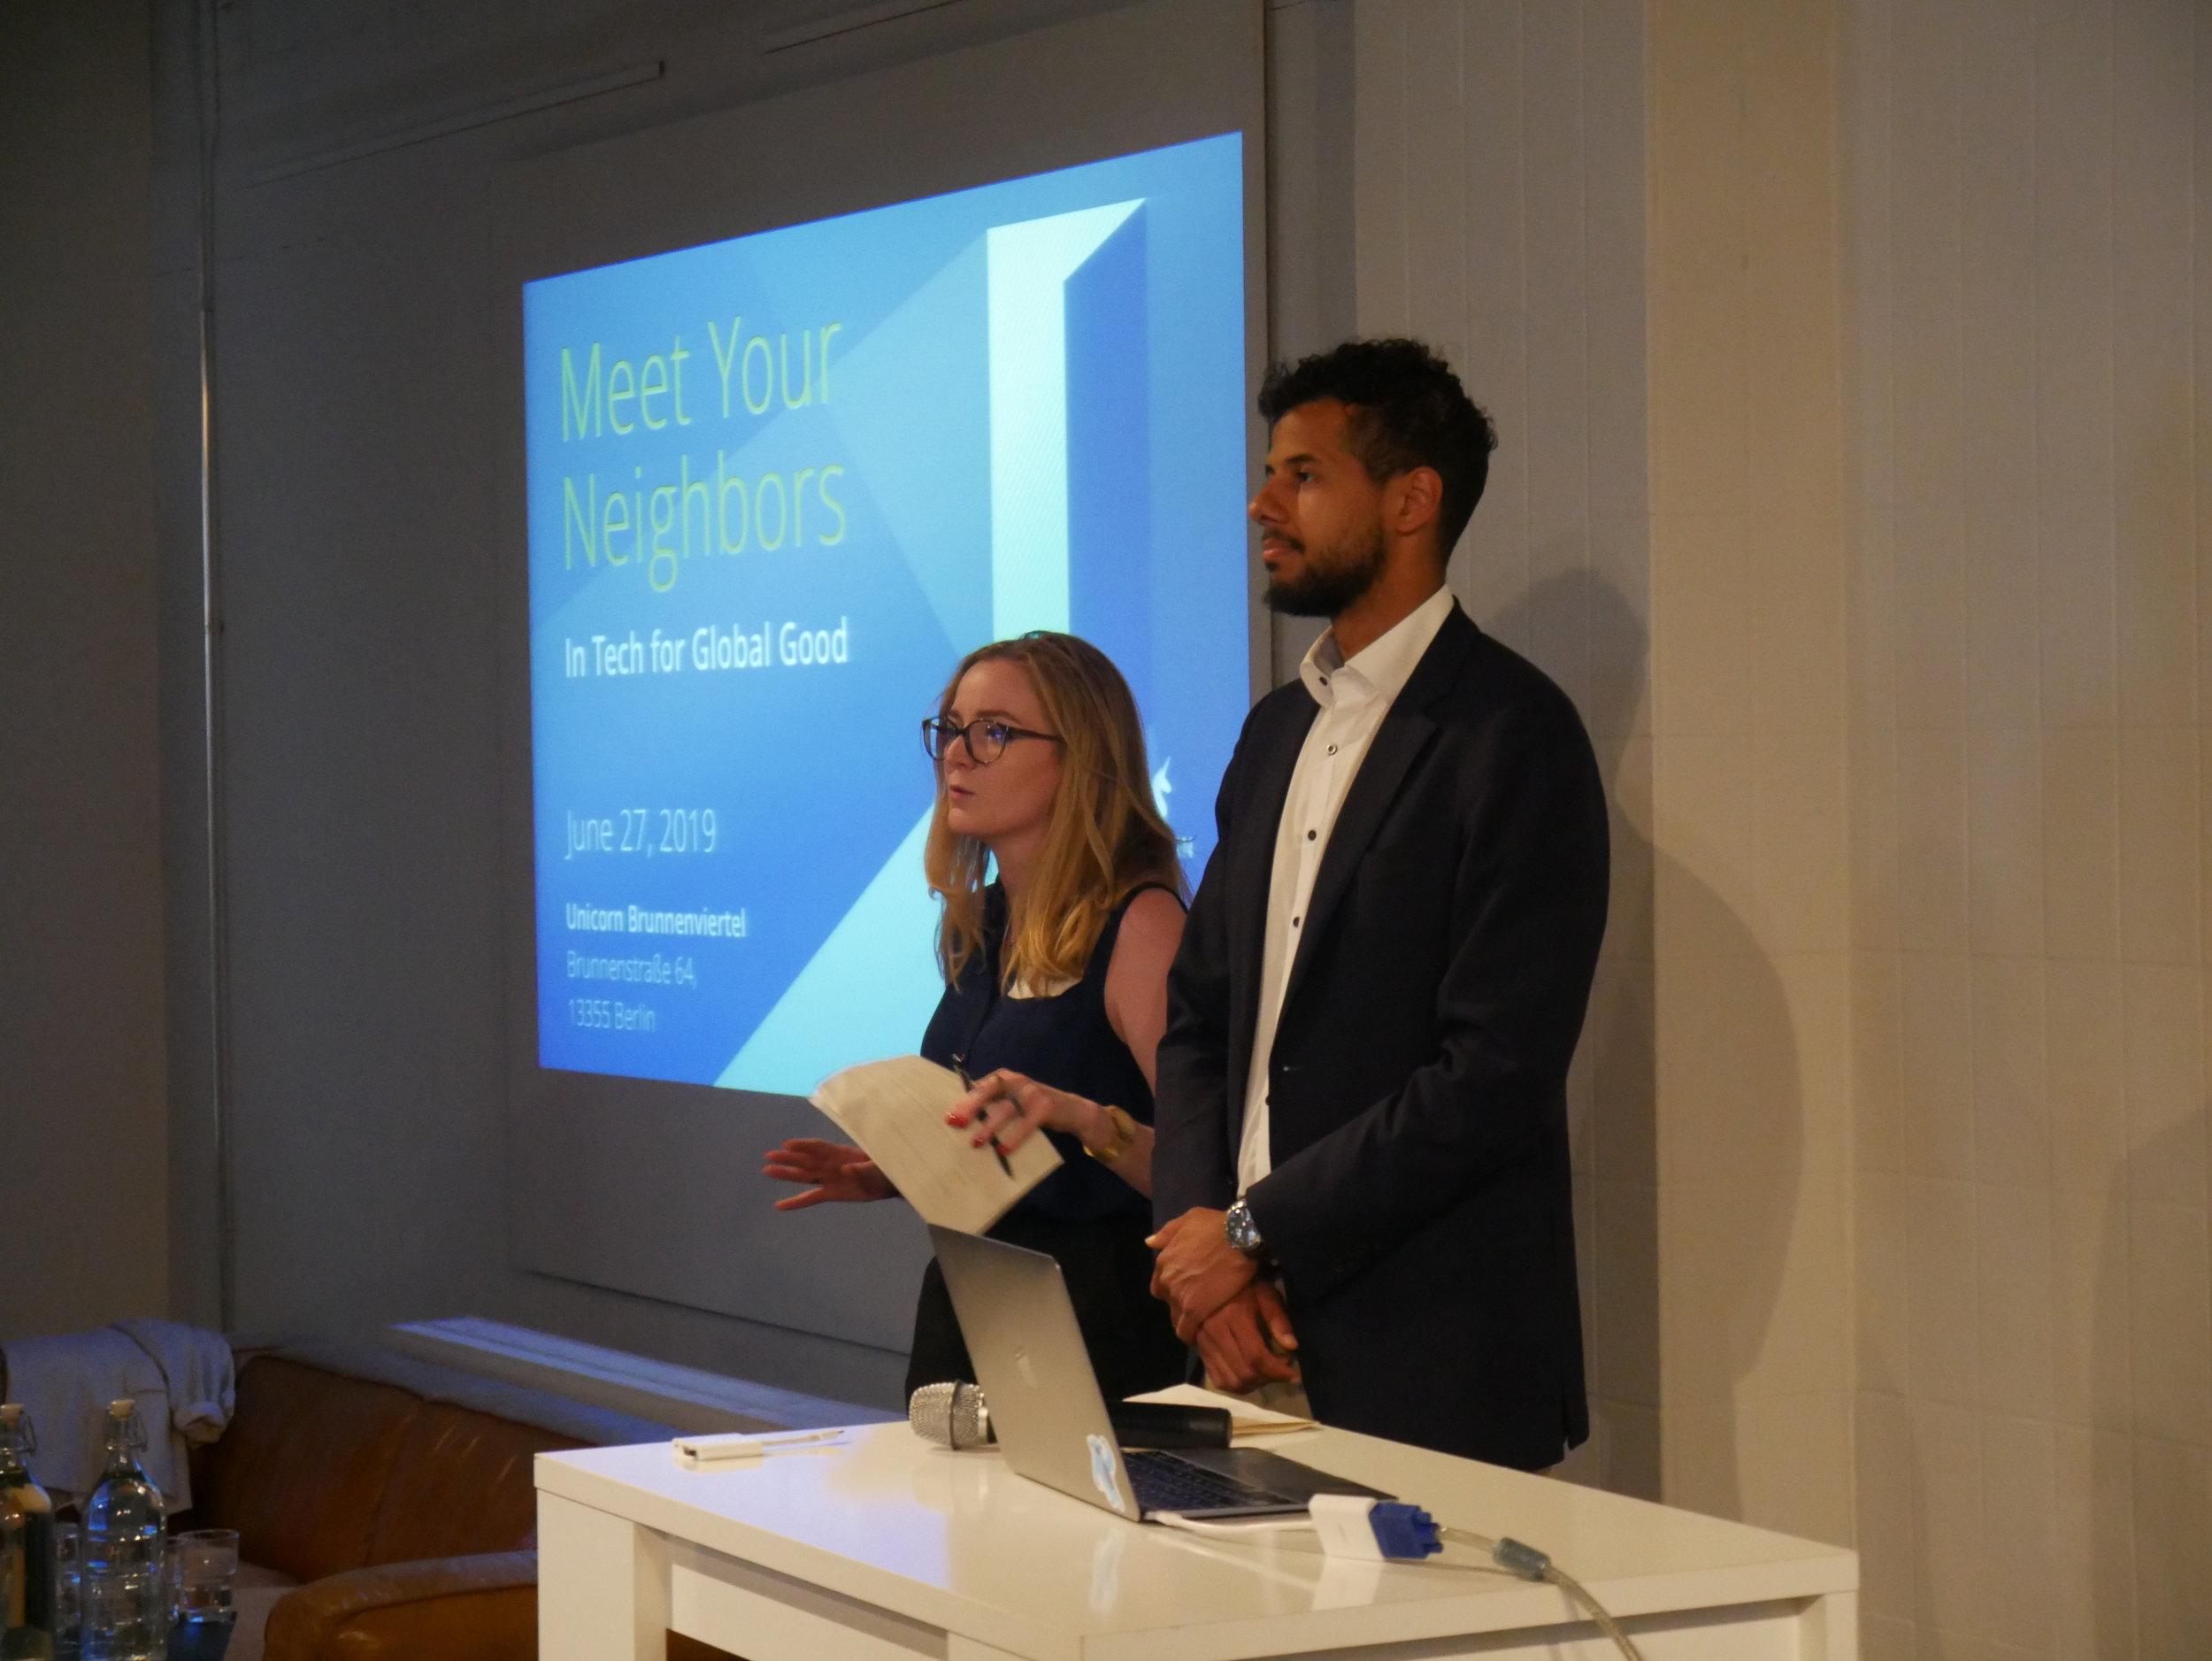 Hosts, Jennifer Bencivenga and Sannssi Cisse